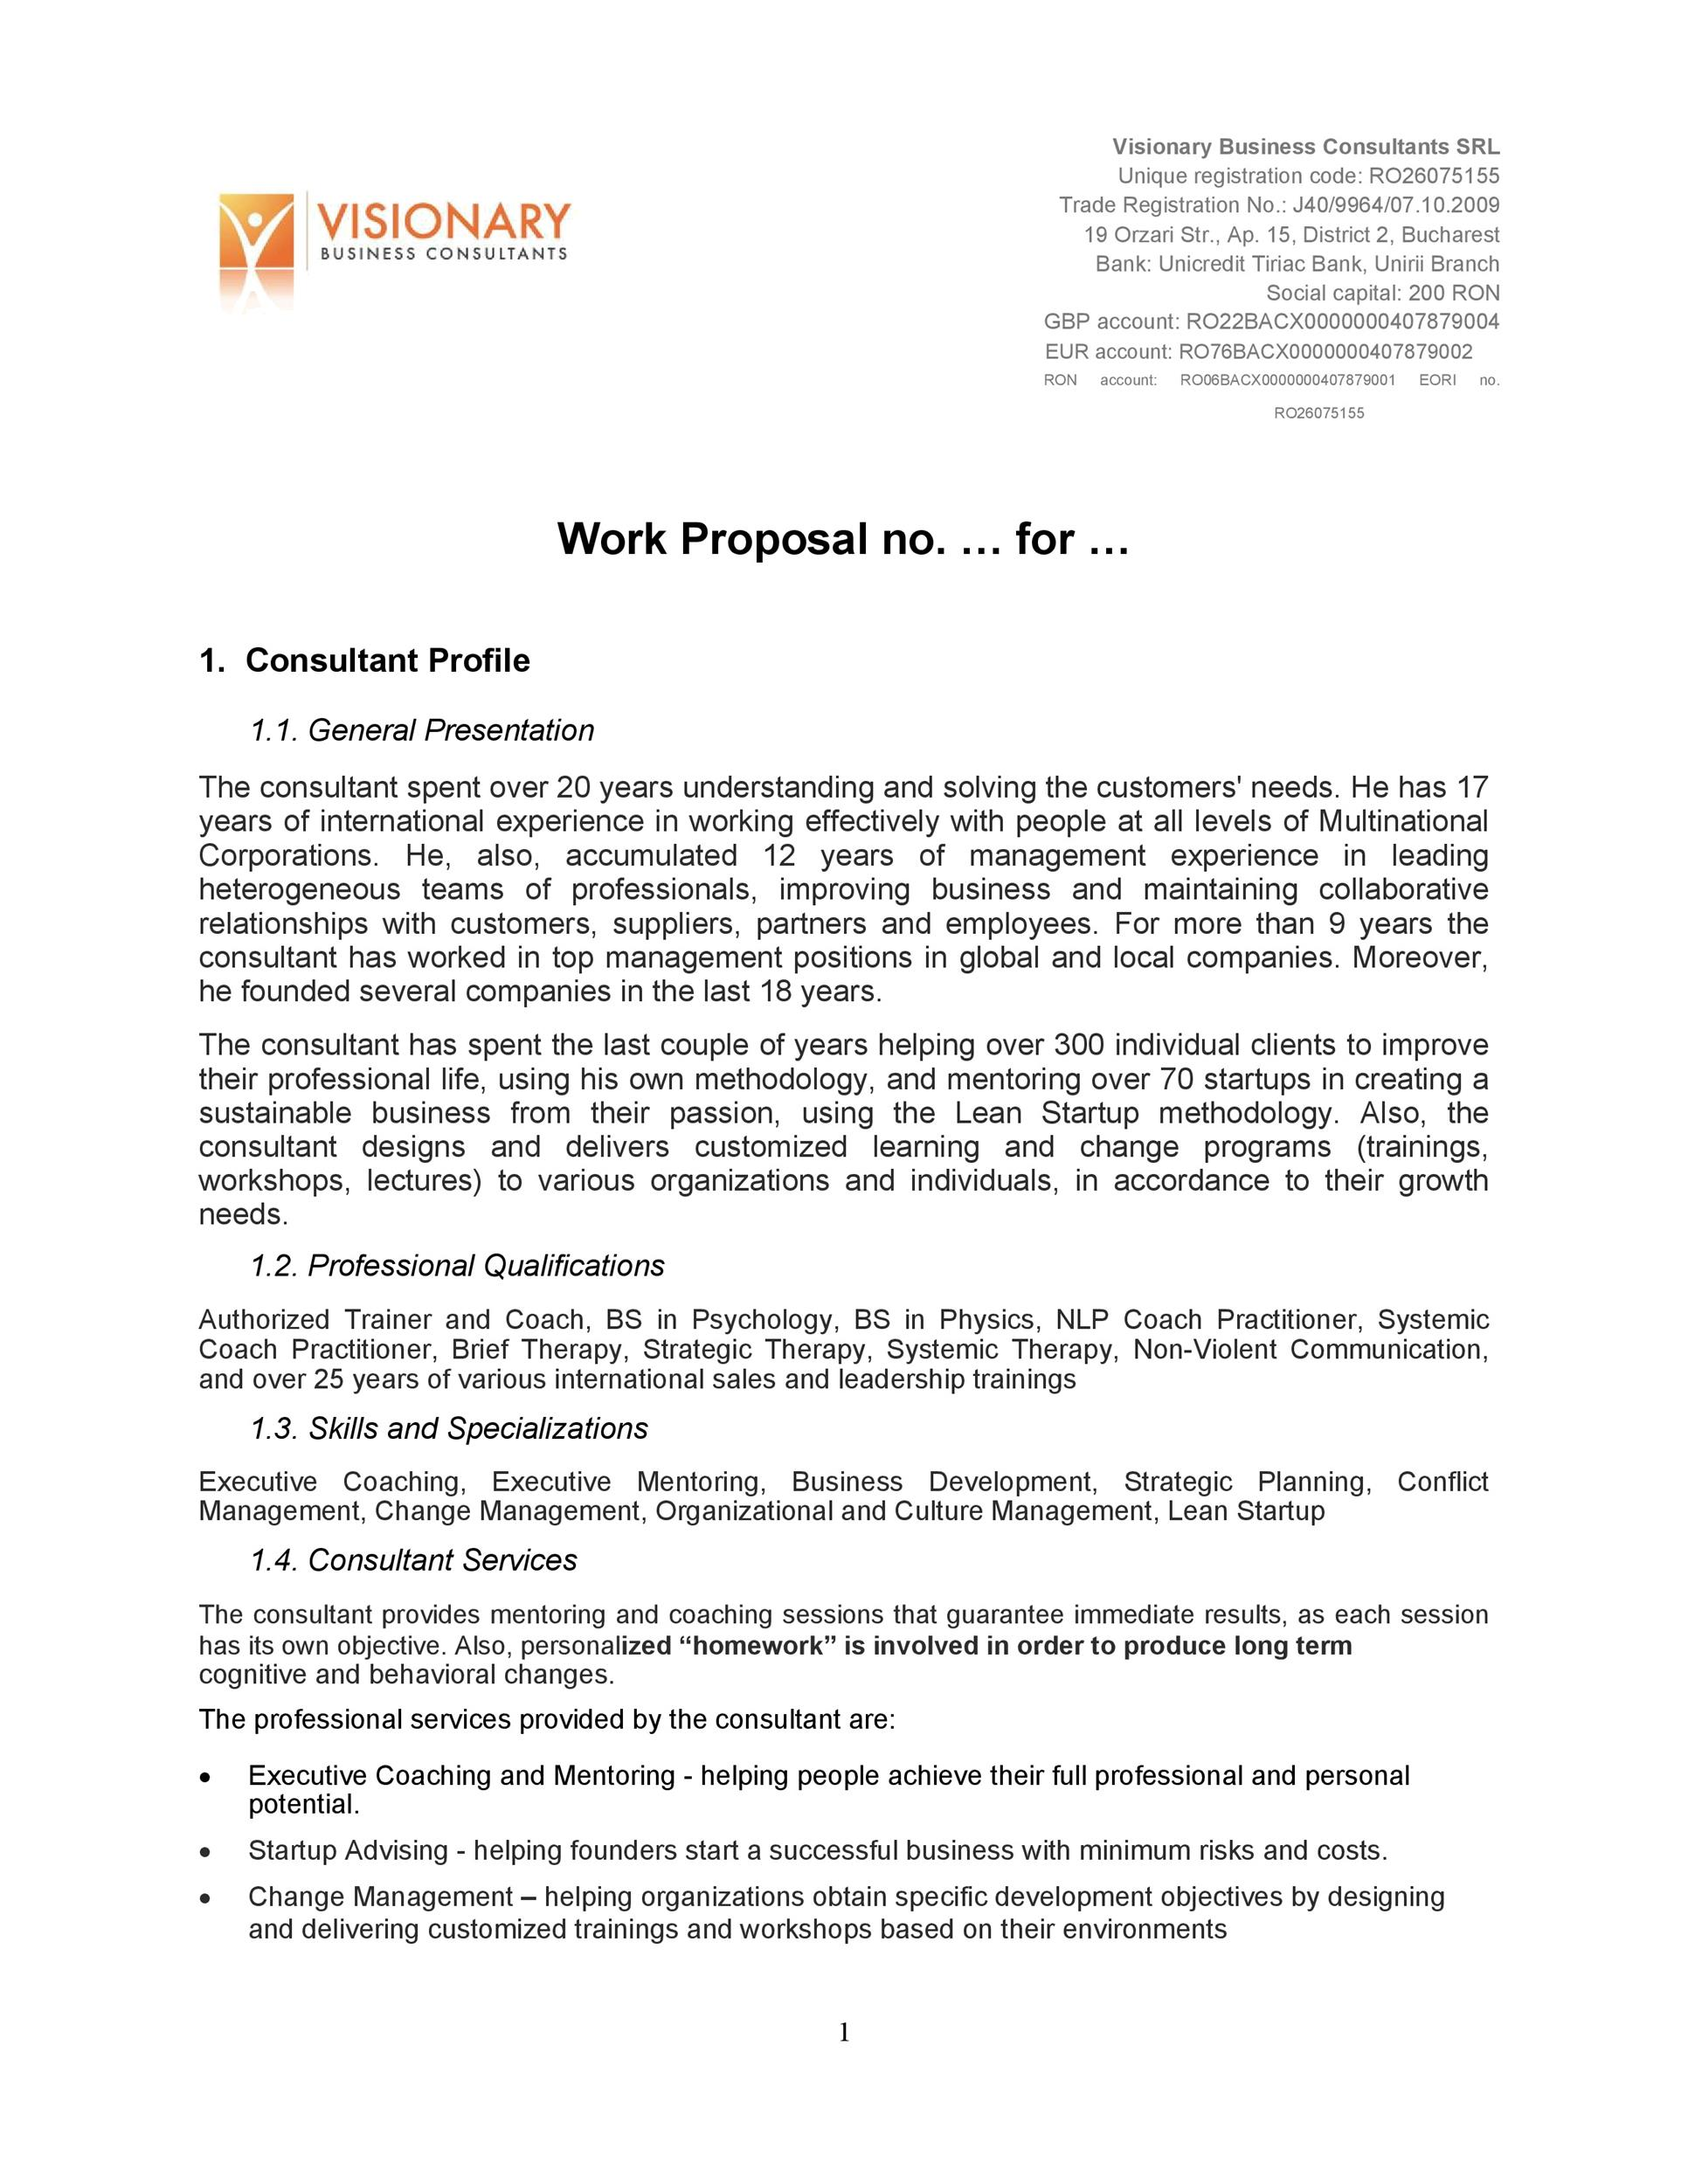 Free Job Proposal Template 31